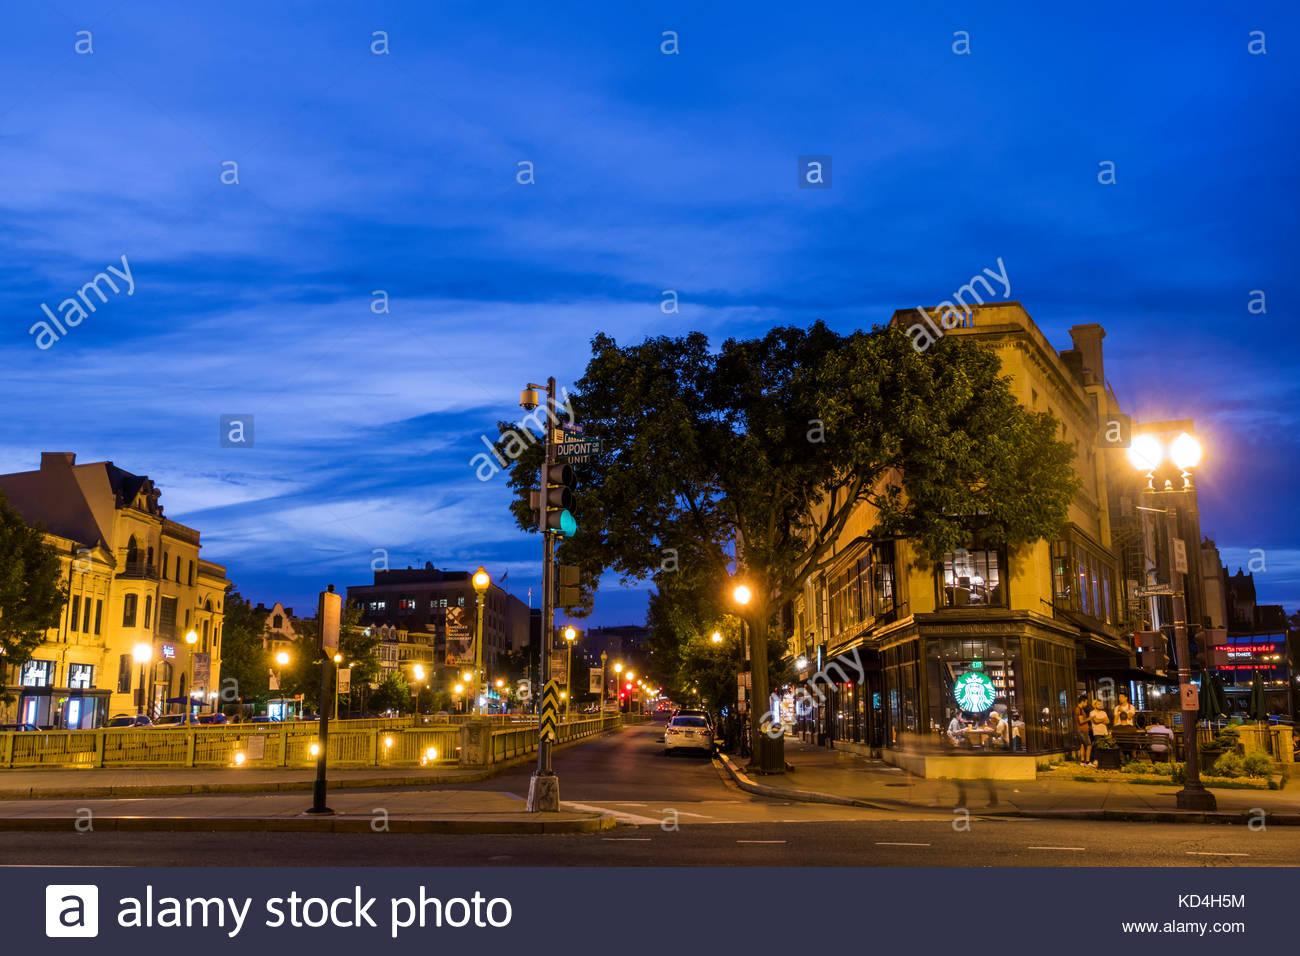 starbucks columbia city